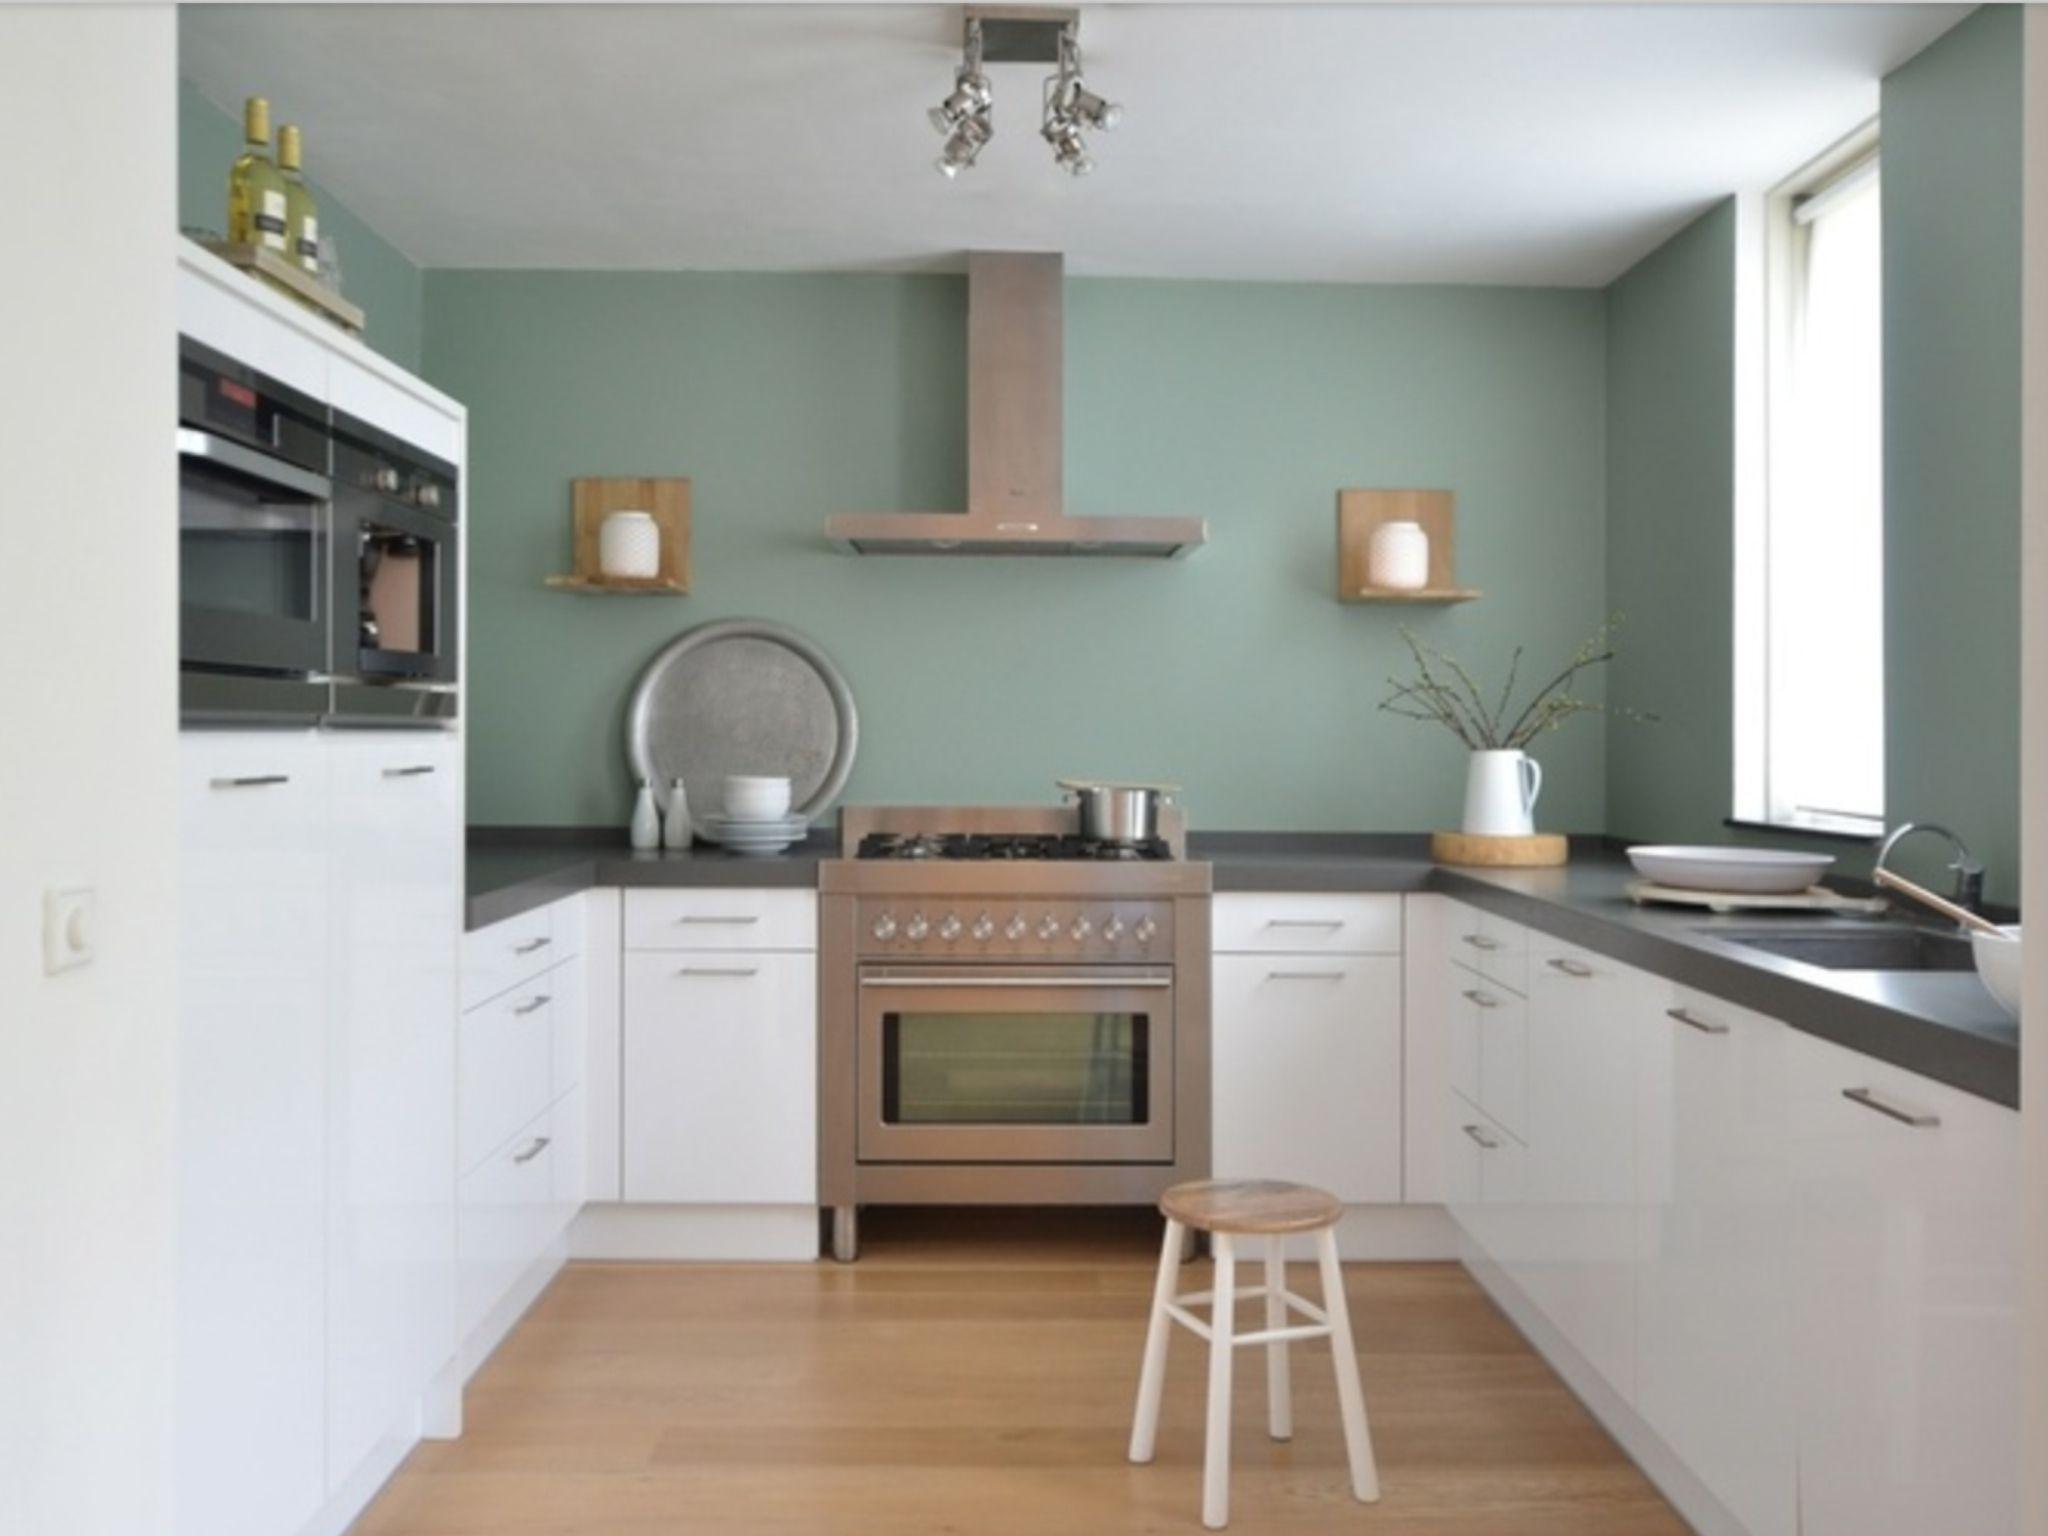 Keuken verven kleur - Kleur witte keuken ...